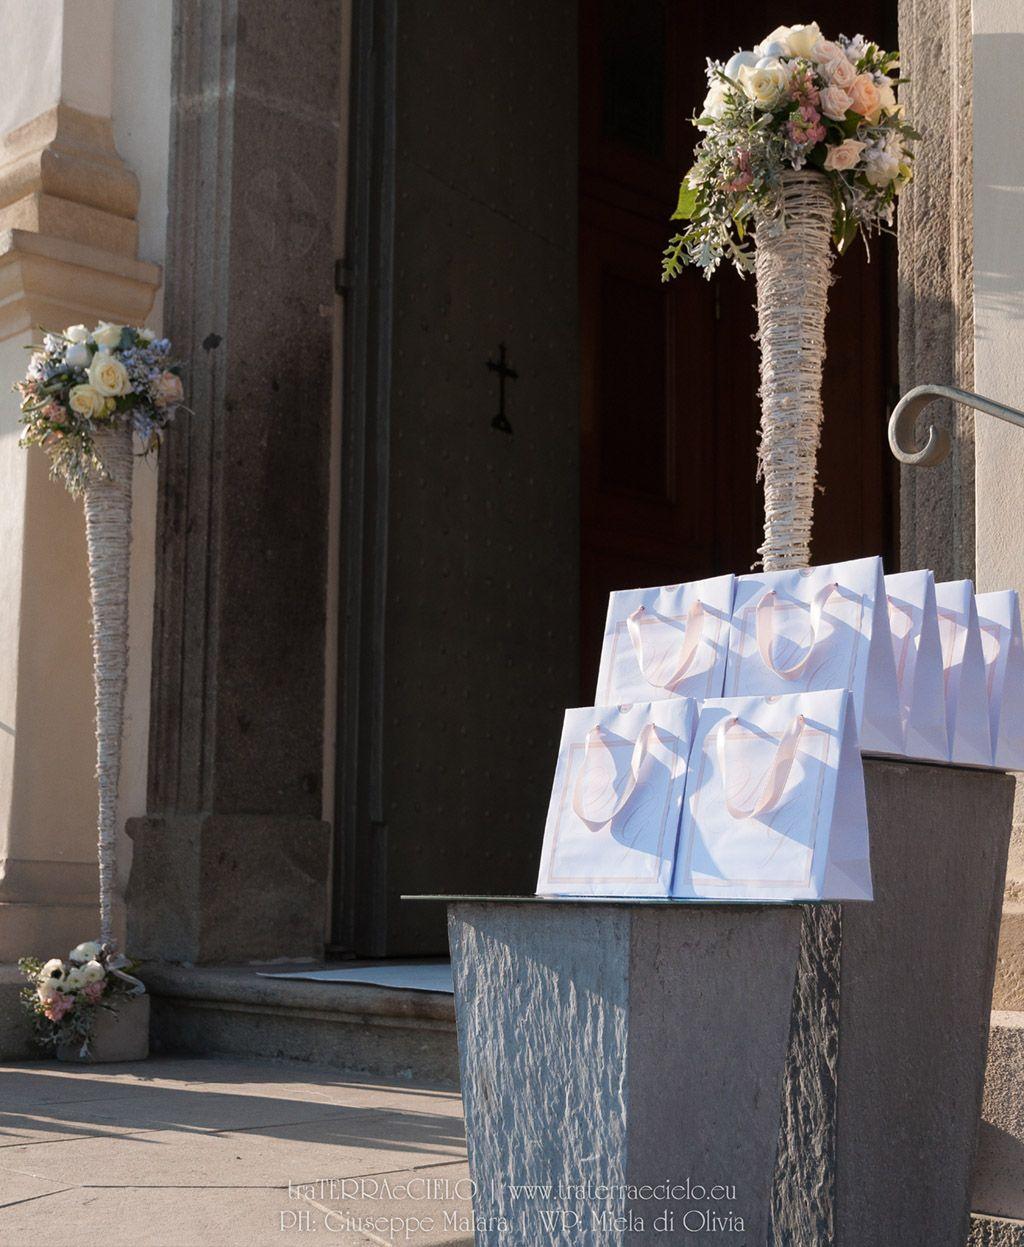 Tableau Matrimonio Natalizio : Matrimonio inverno sposa sposo portafedi tableau de mariage